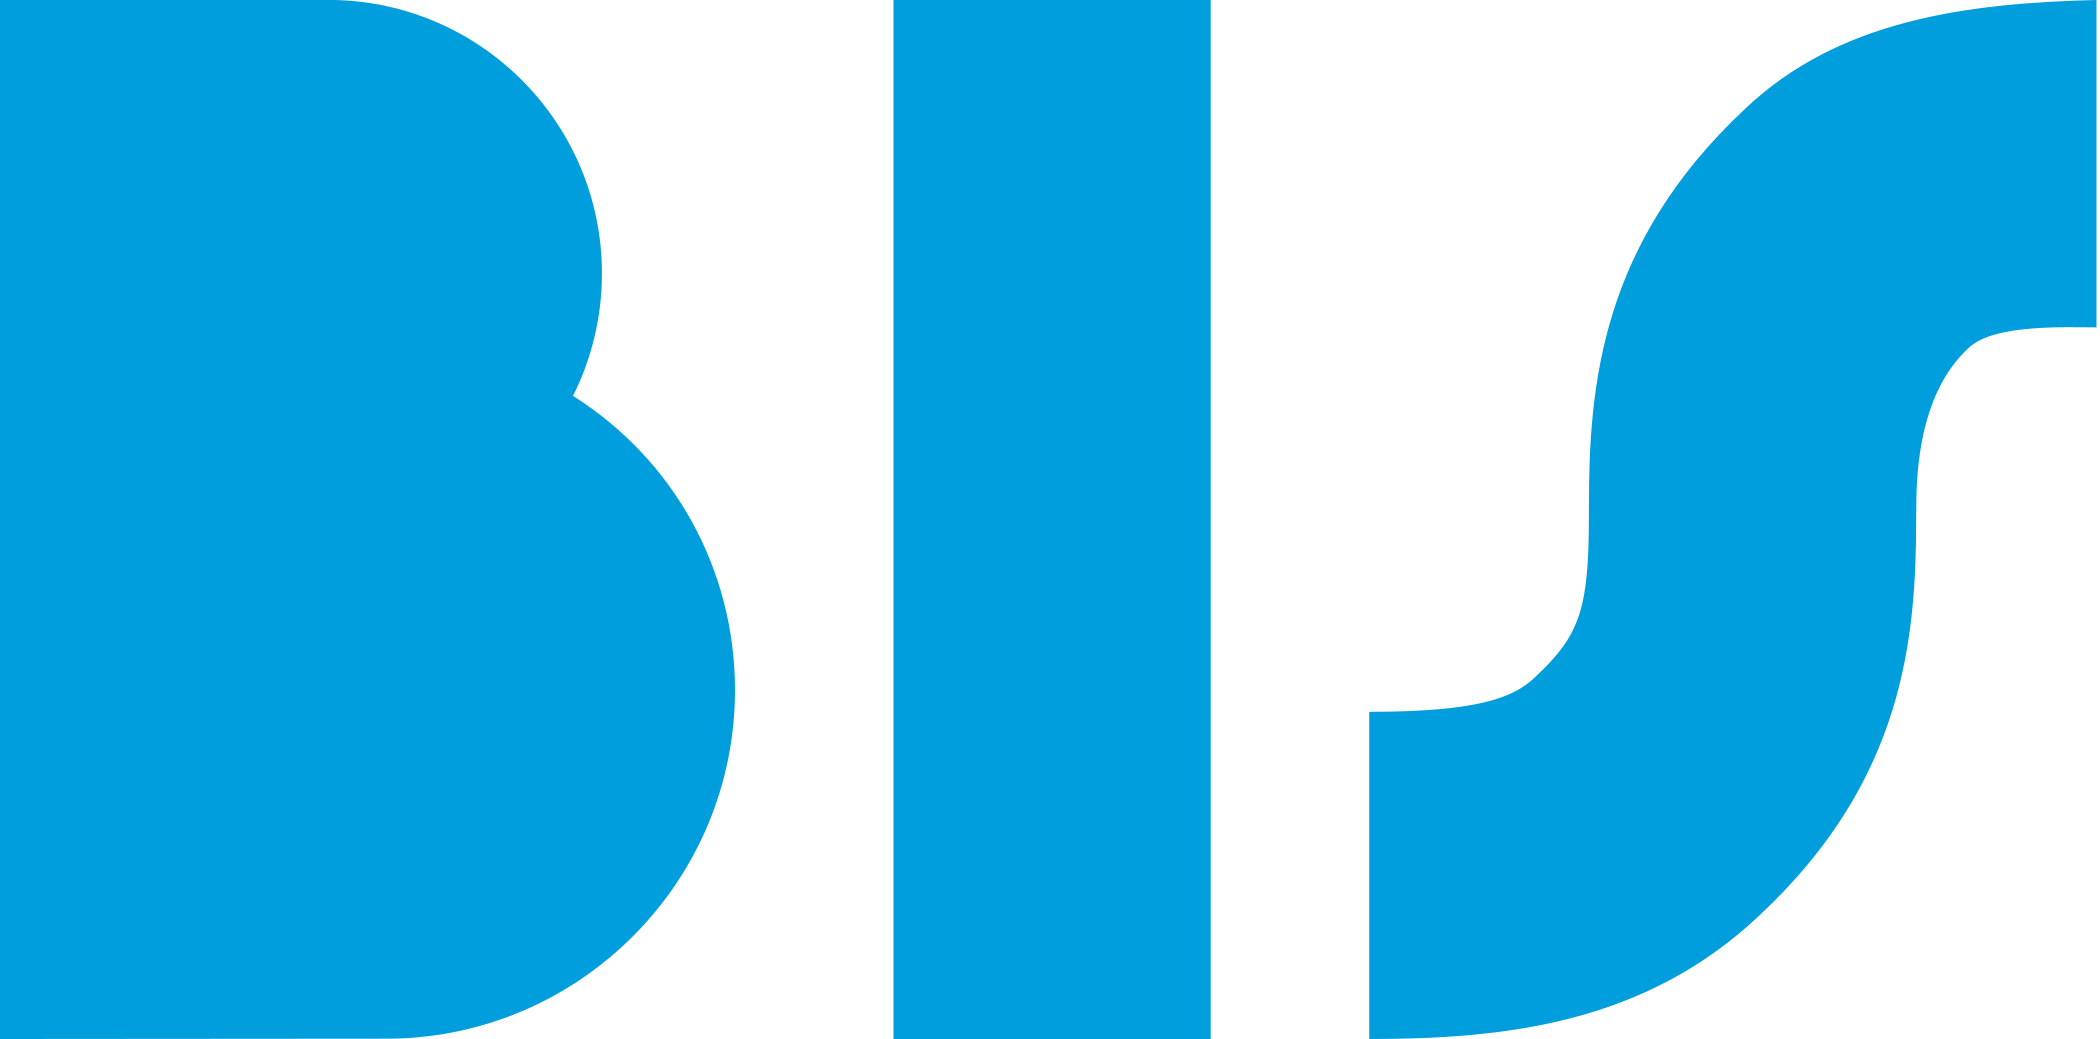 canal bis logo 3 - Canal Bis Logo